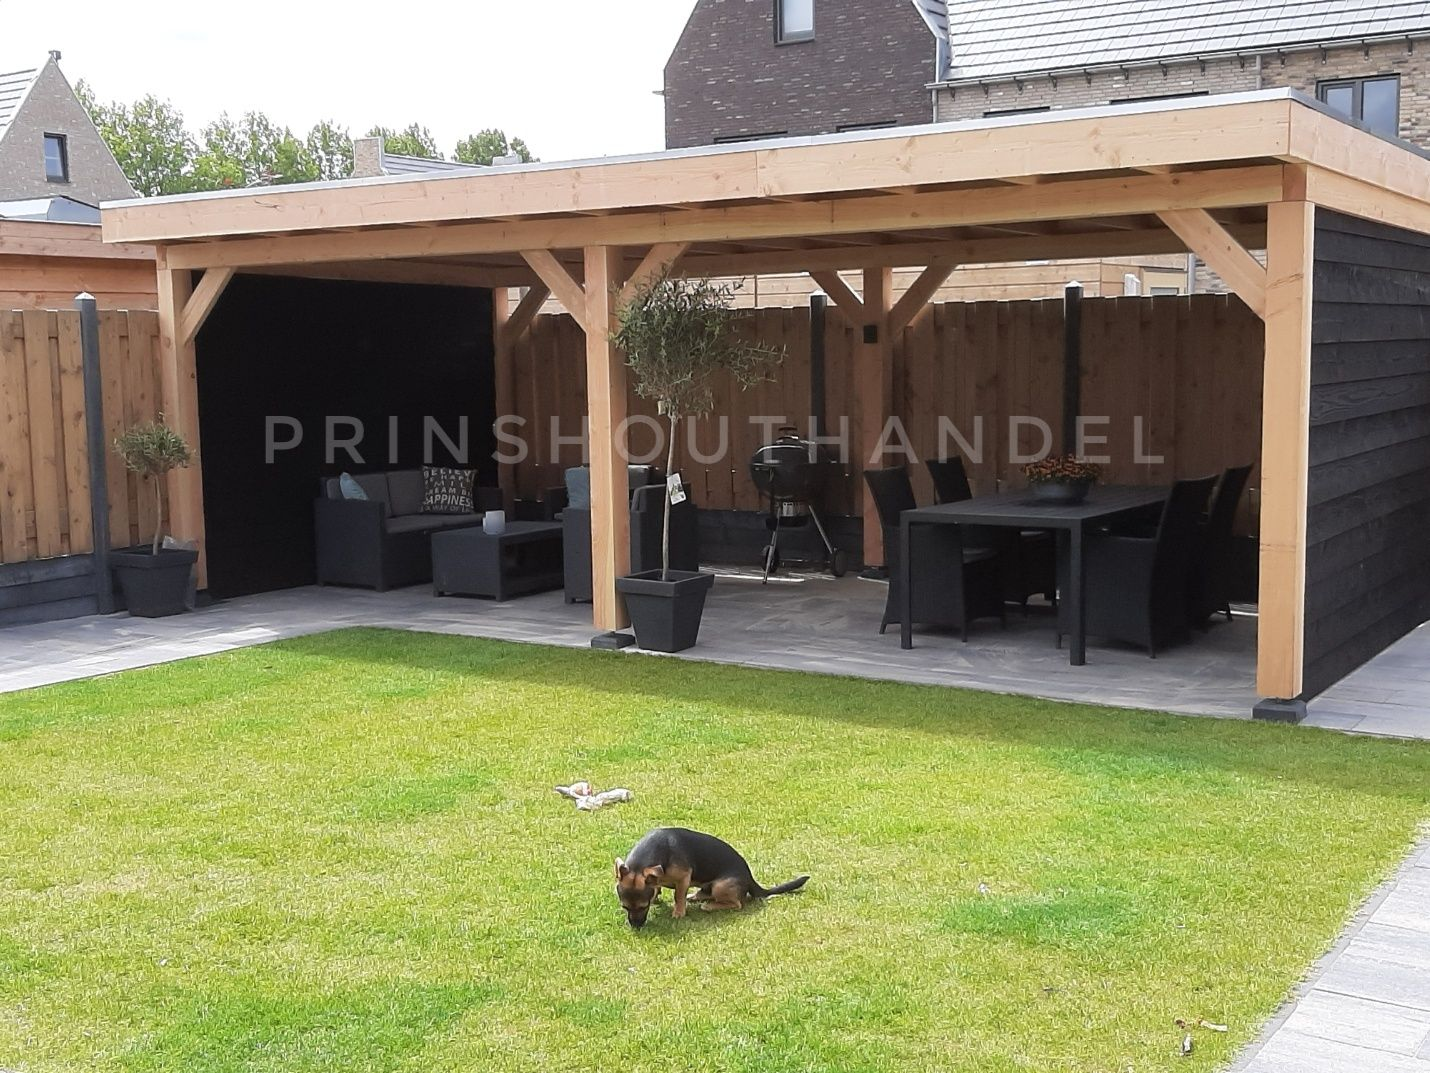 Douglas hout Prins Houthandel Purmerend / Beemster